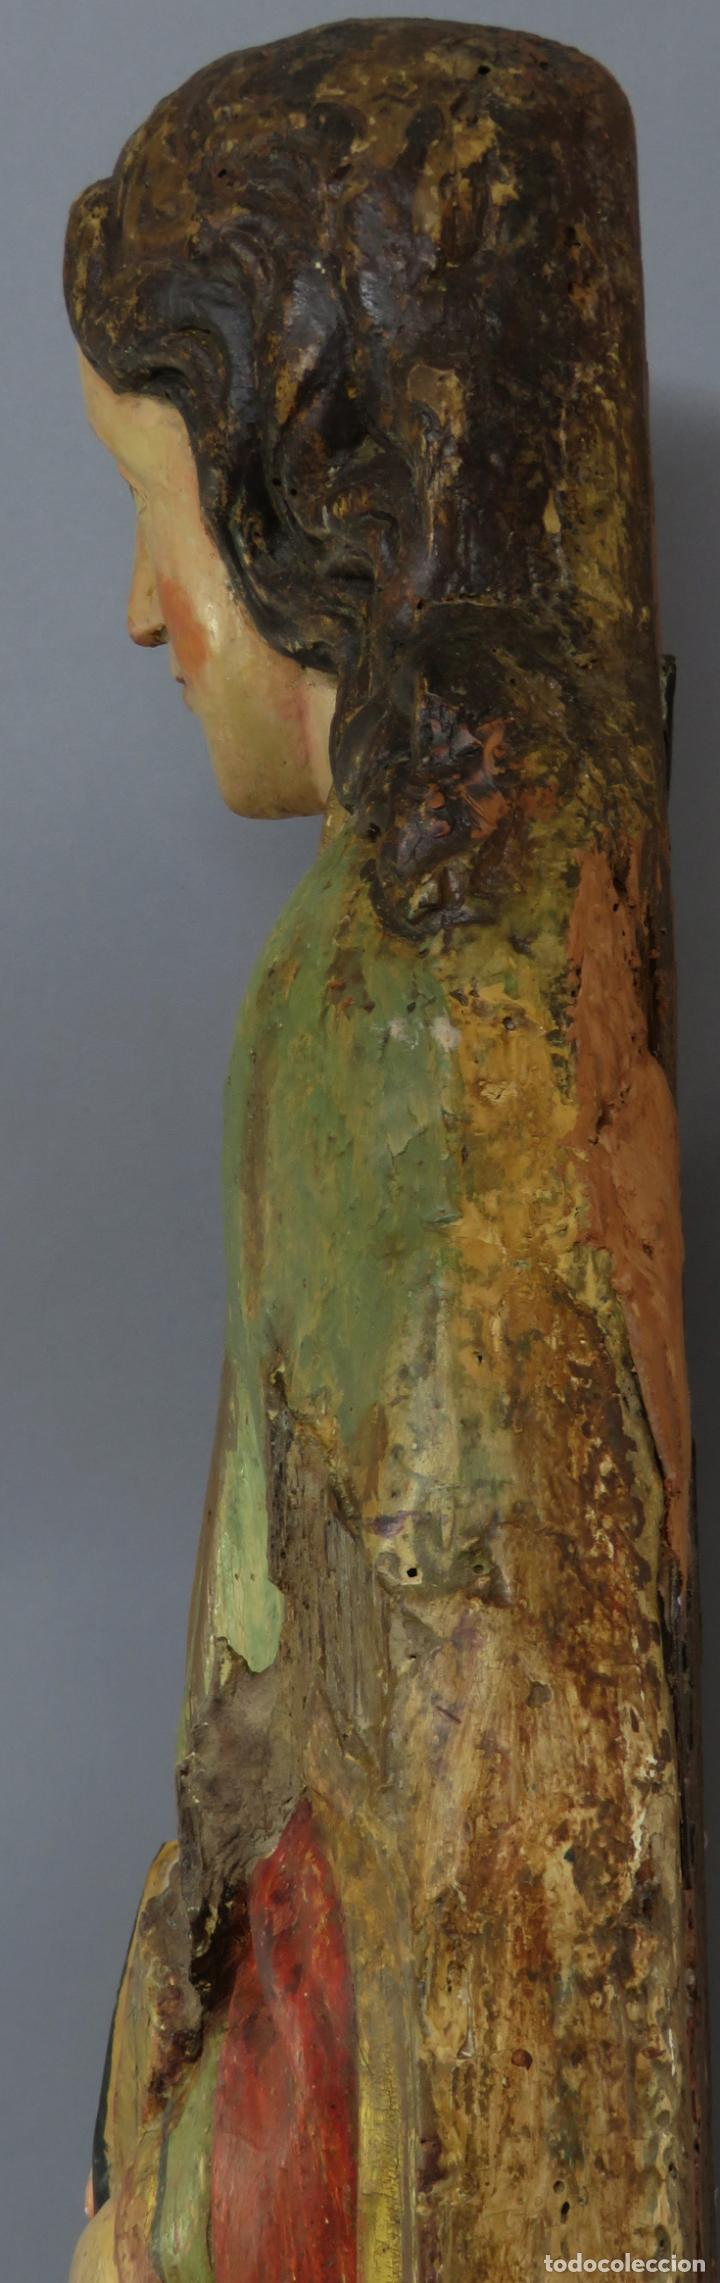 Arte: Talla de medio bulto o chuleta San Juan Evangelista madera tallada dorada y policromada XVI XVII - Foto 21 - 221922775